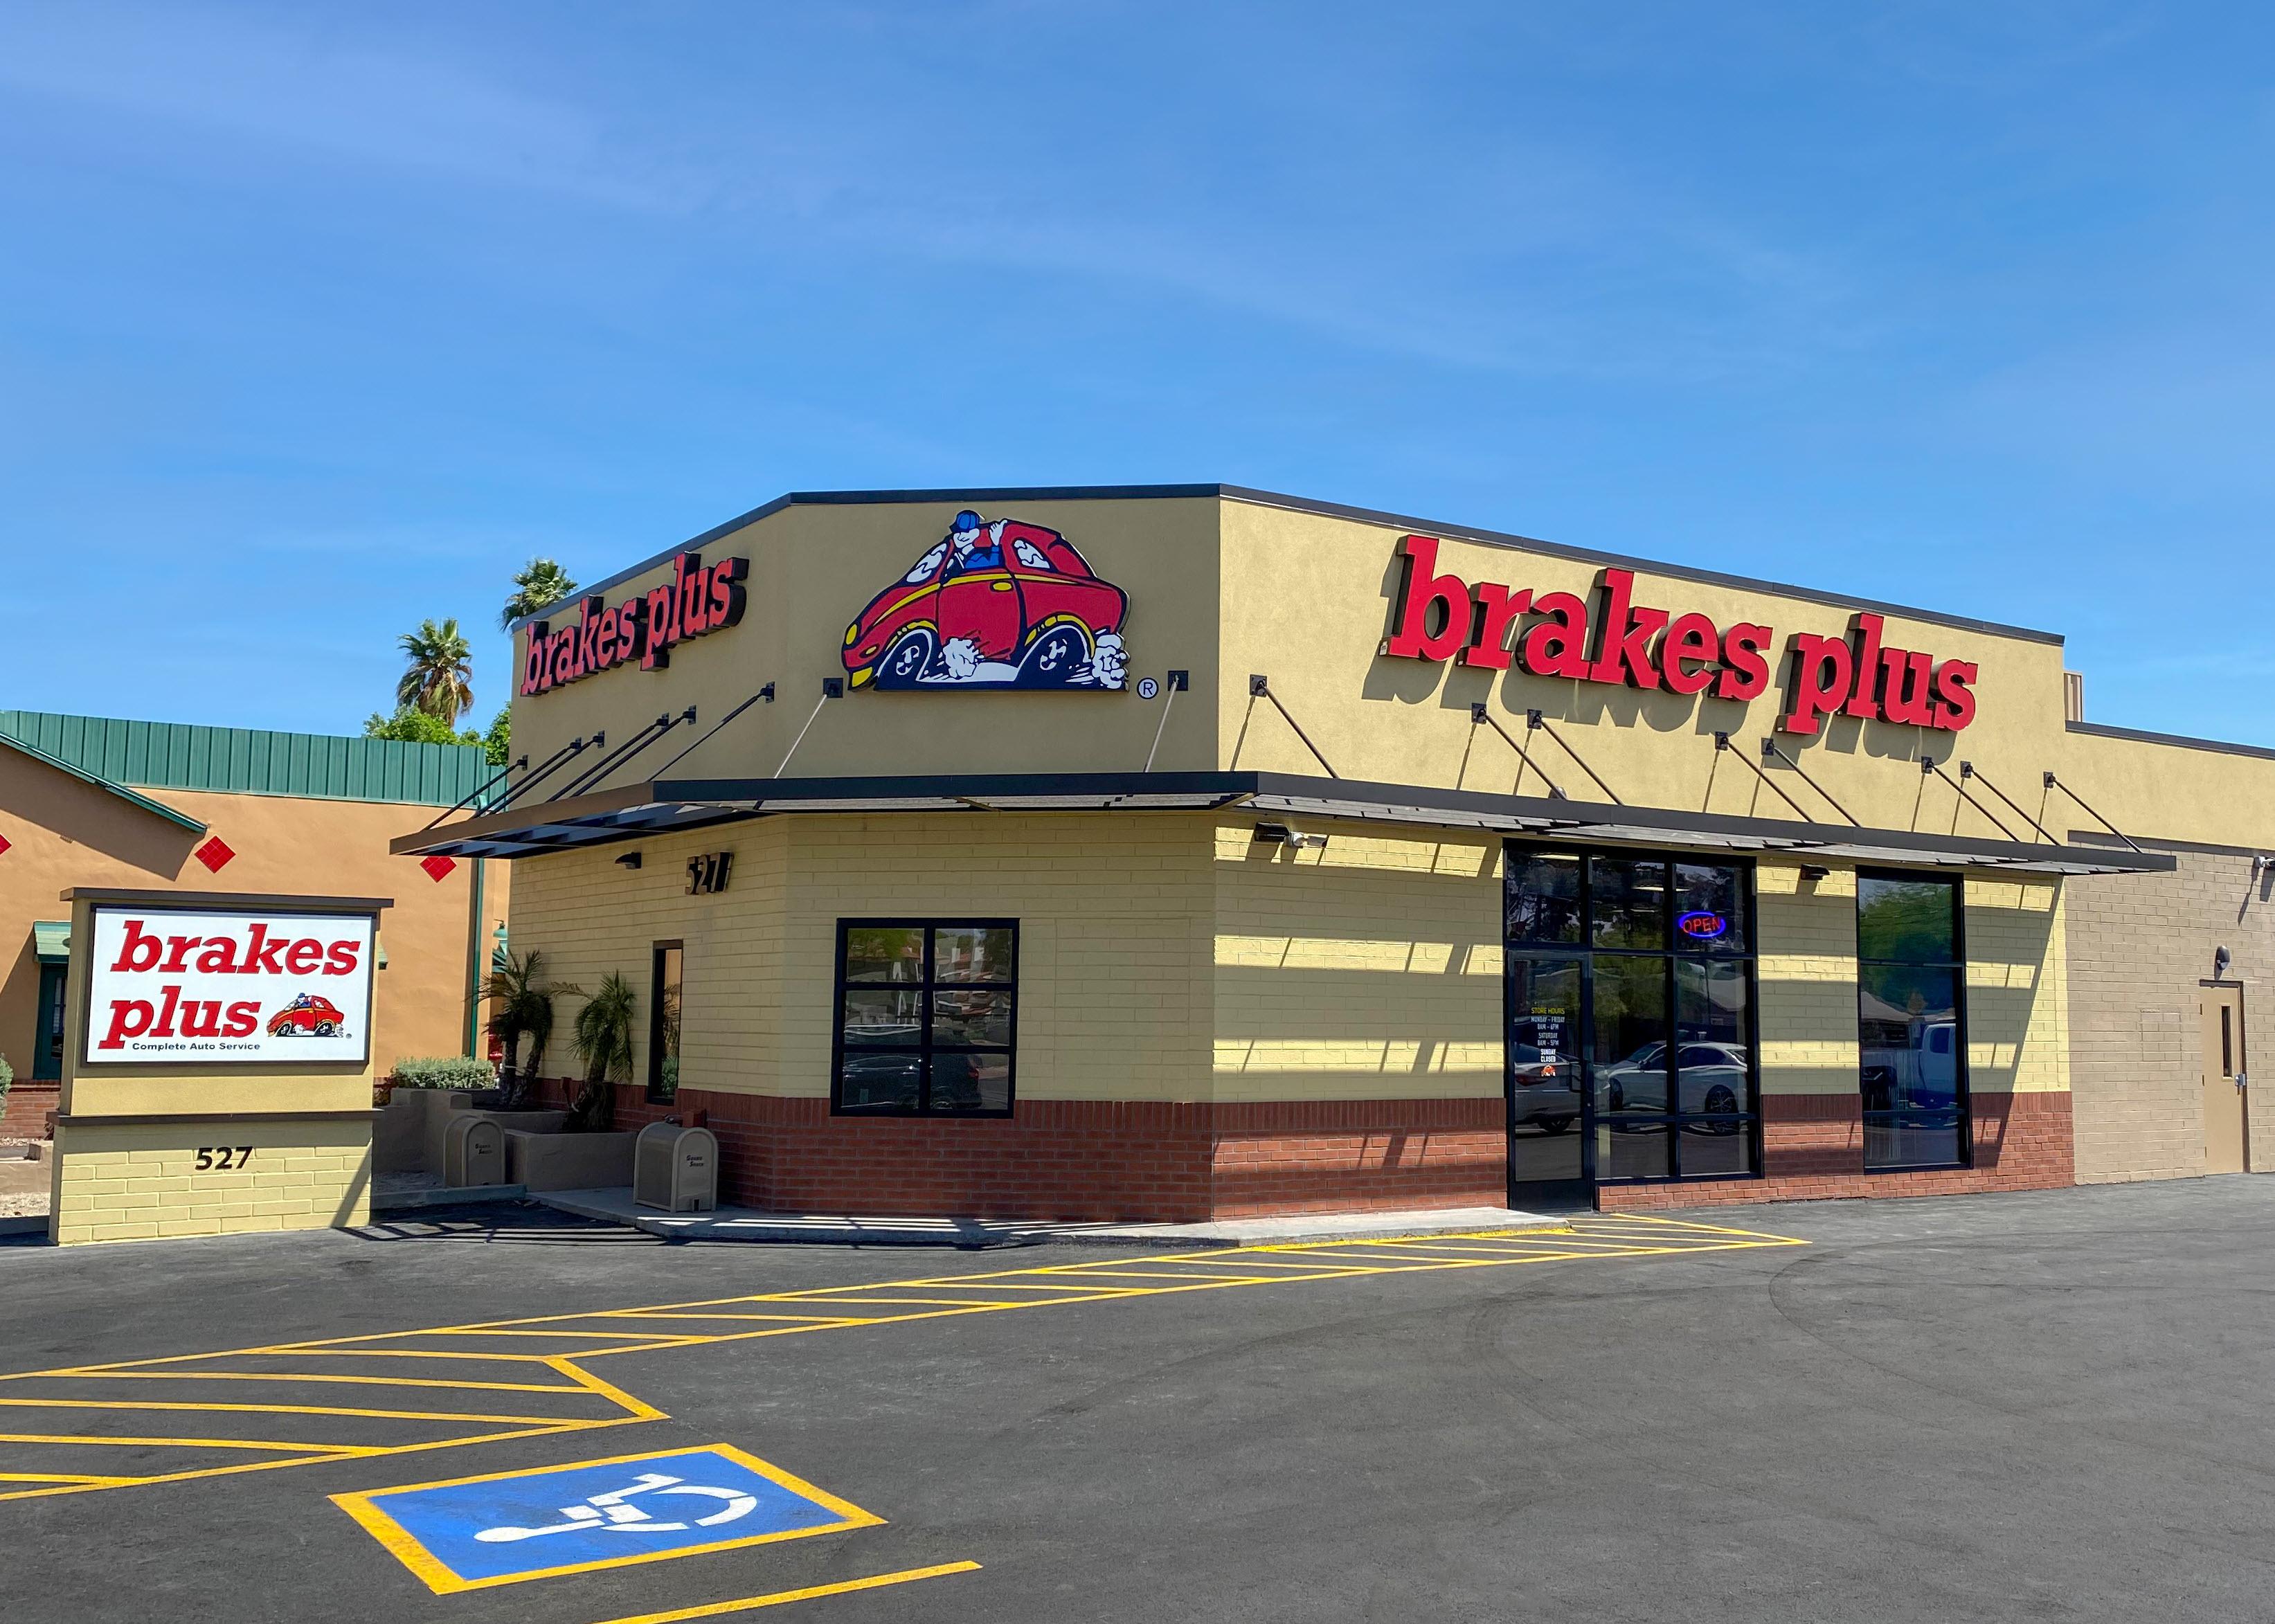 Brakes Plus at Tempe, AZ - Mitchell Park